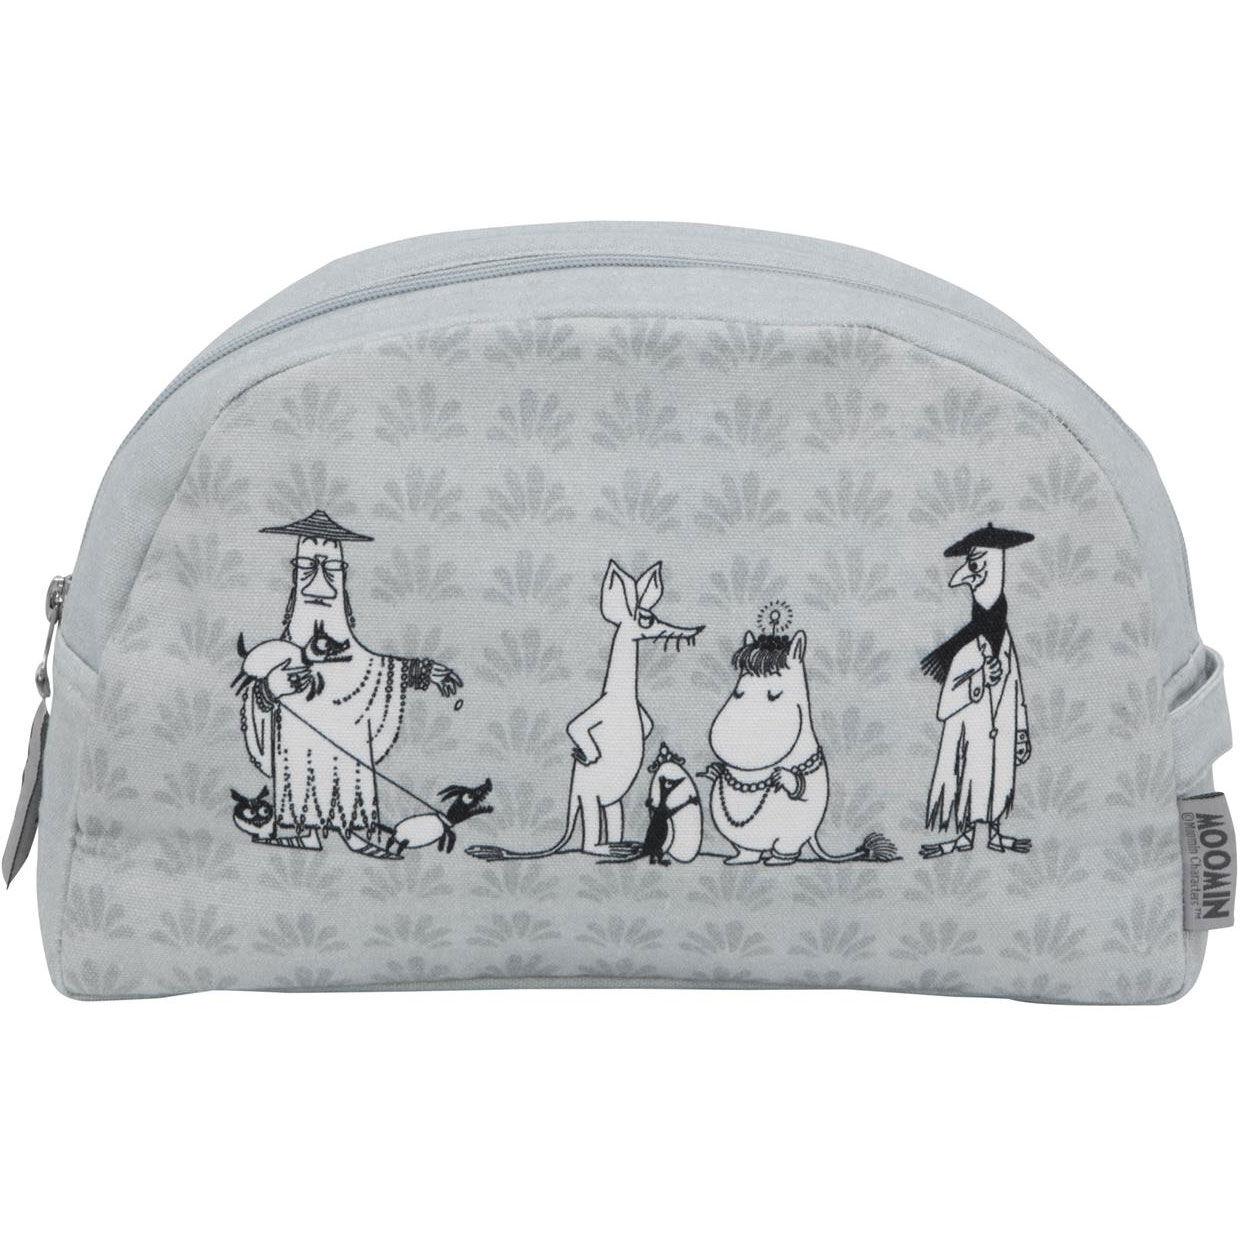 Moomin Moomin Toiletry Bag, Grey/Blue